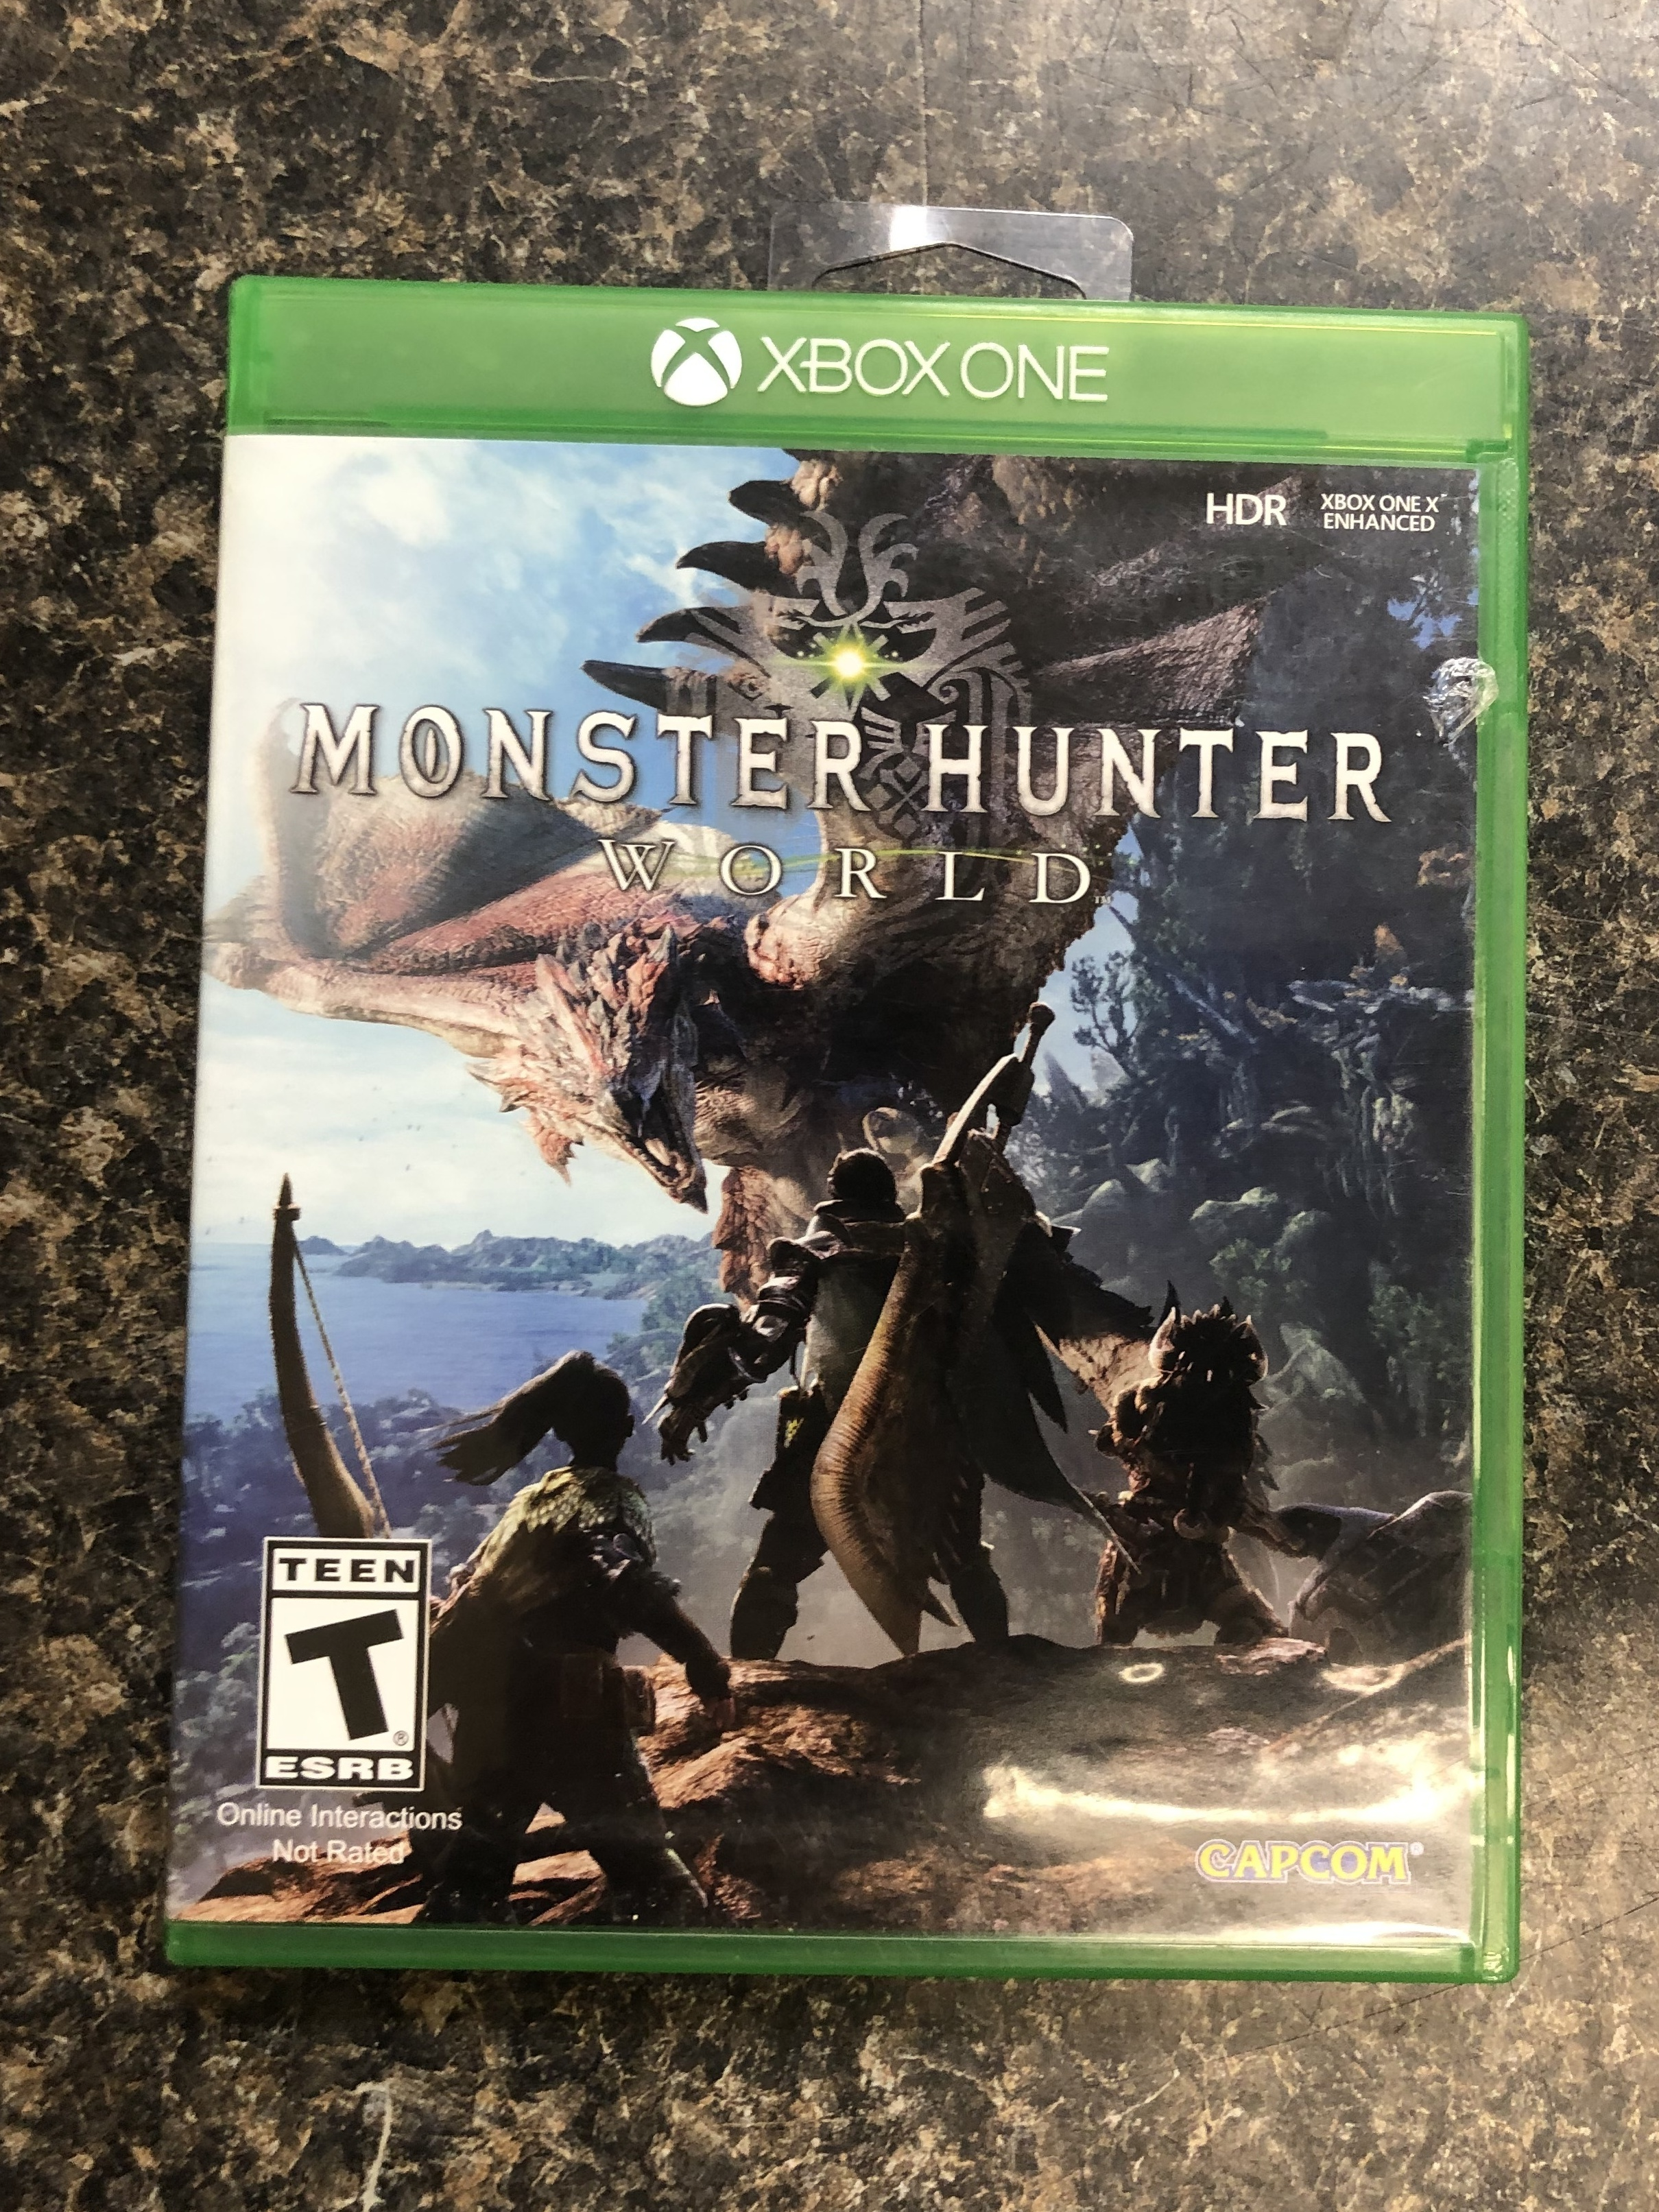 MONSTER HUNTER WORLD - XBOX ONE GAME